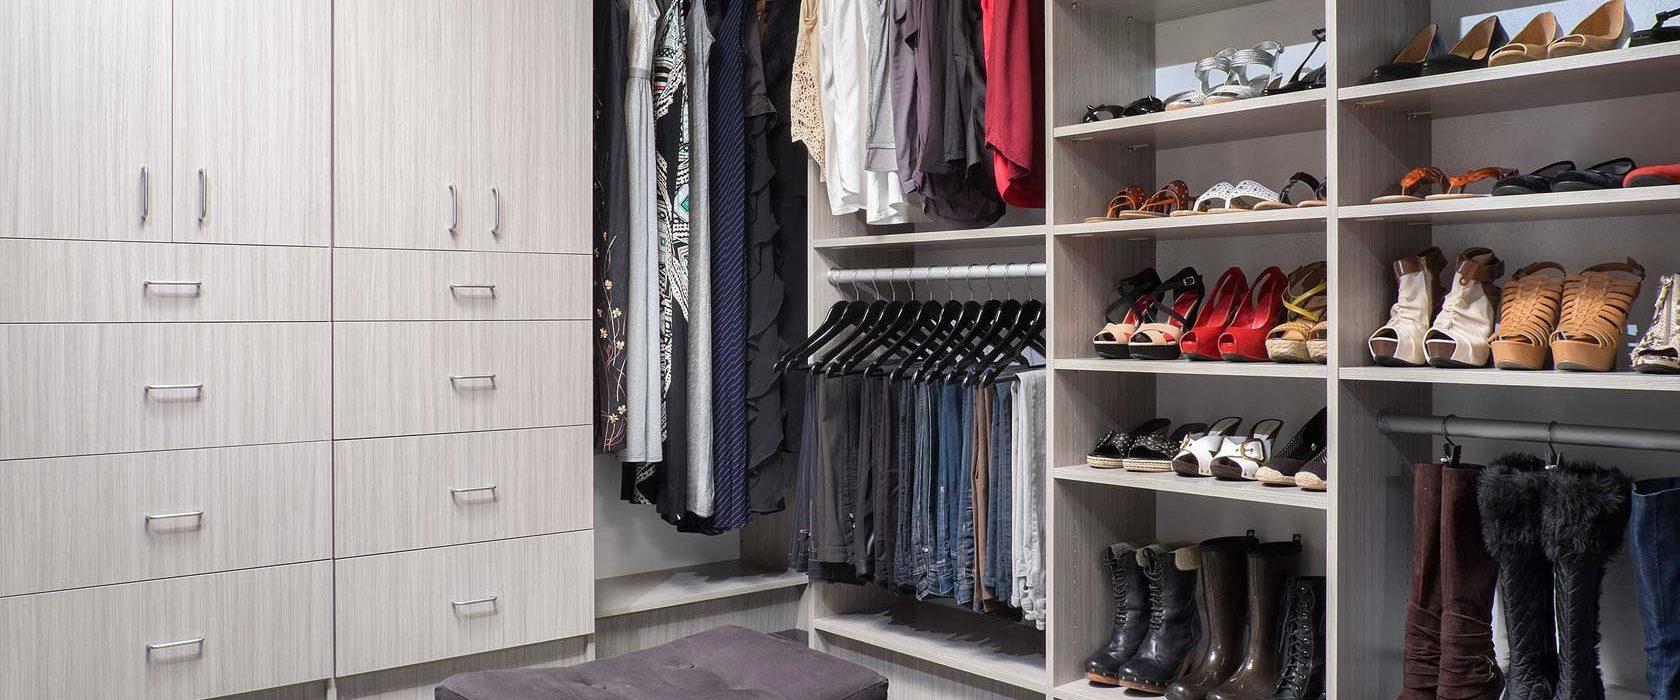 Custom Closet Organizers Cabinets Company Name